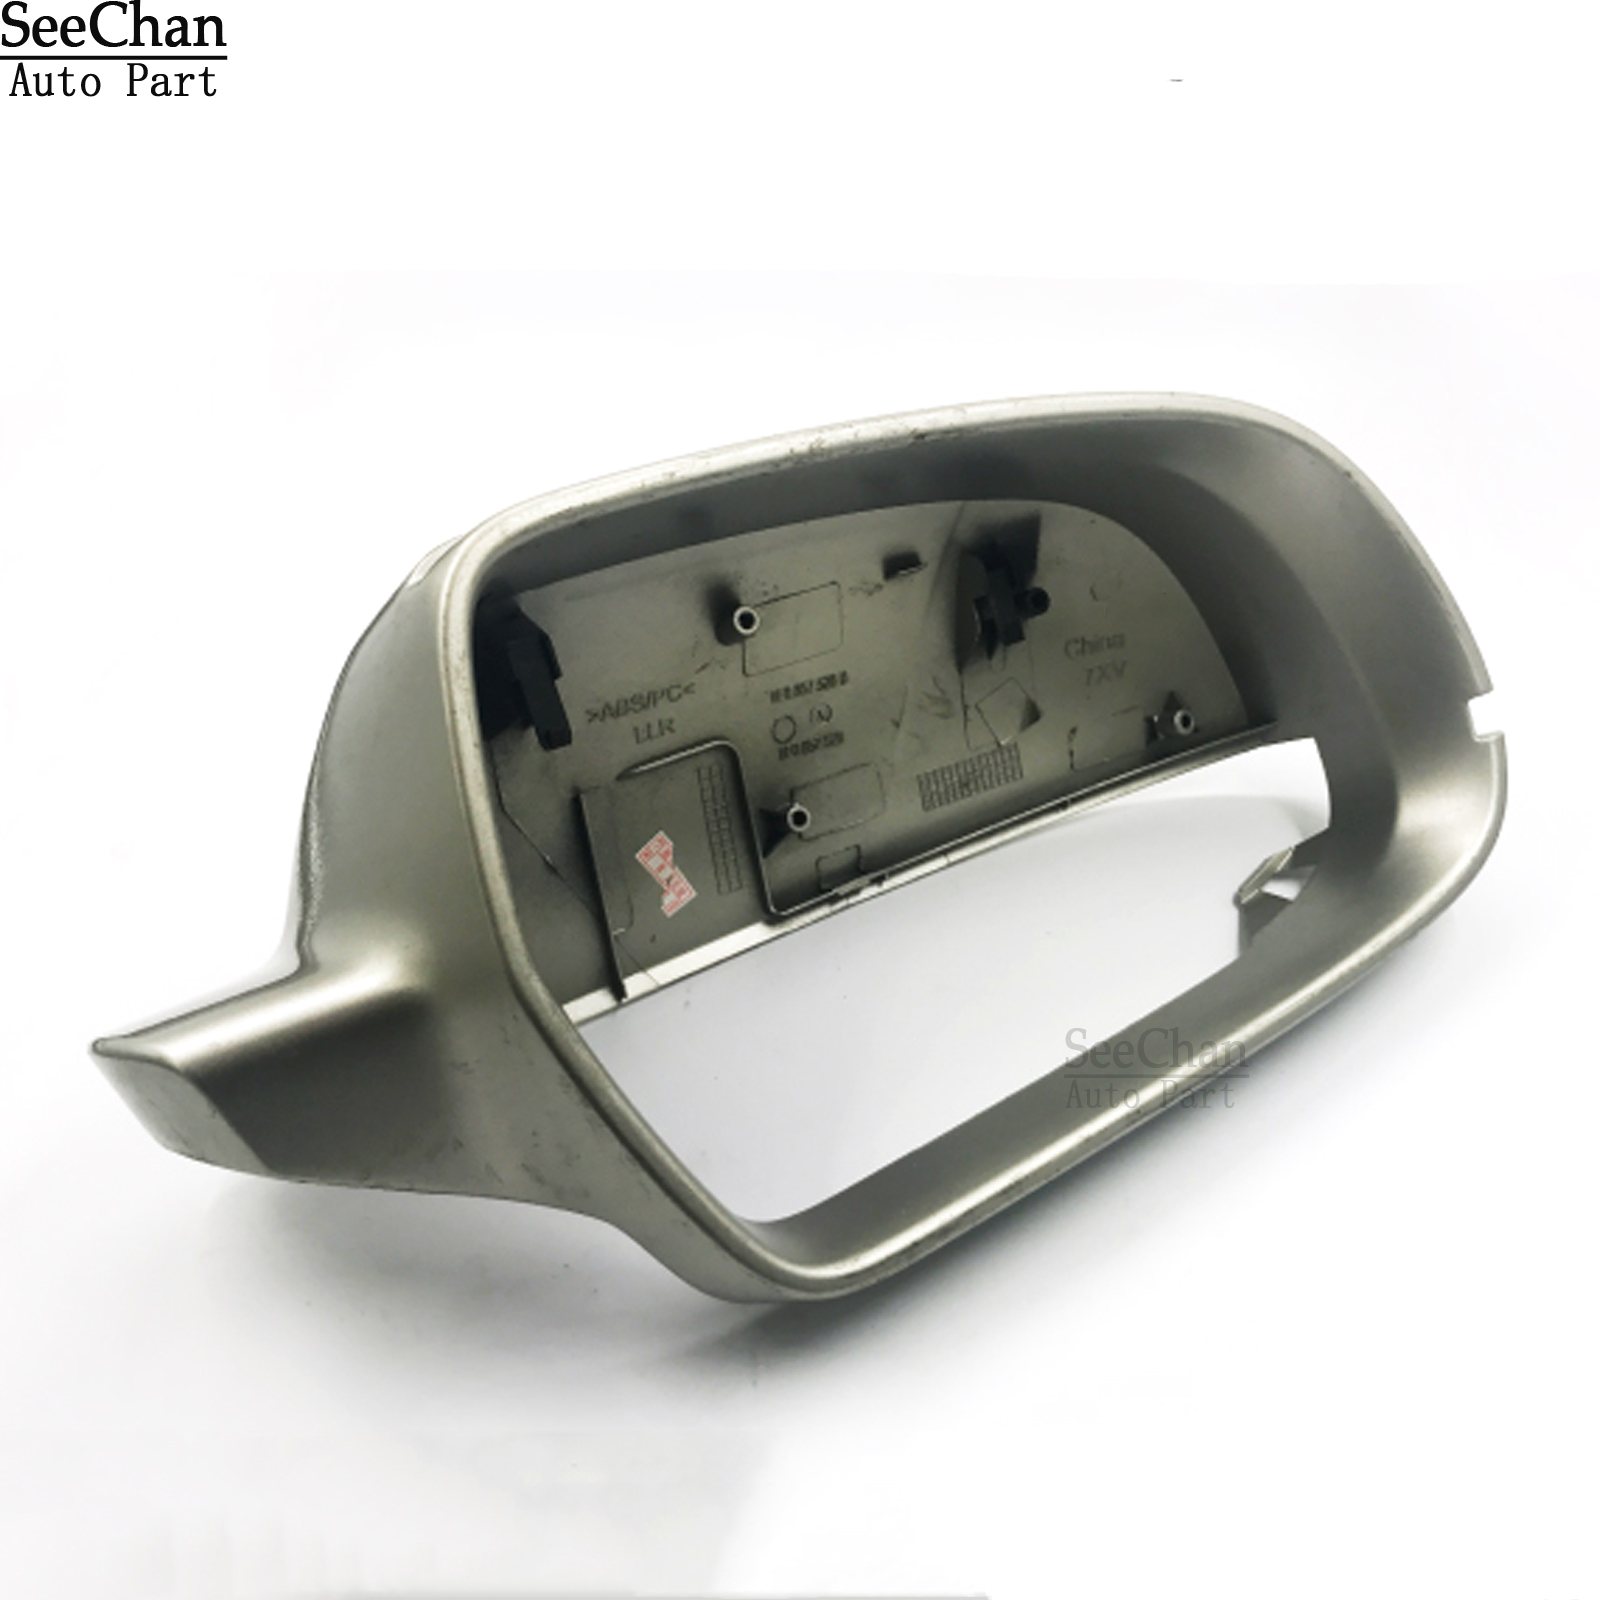 Car Side Mirror Cap Cover Housing For Audi A4 A5 S4 S5 S-Line L+R Chrome Silver